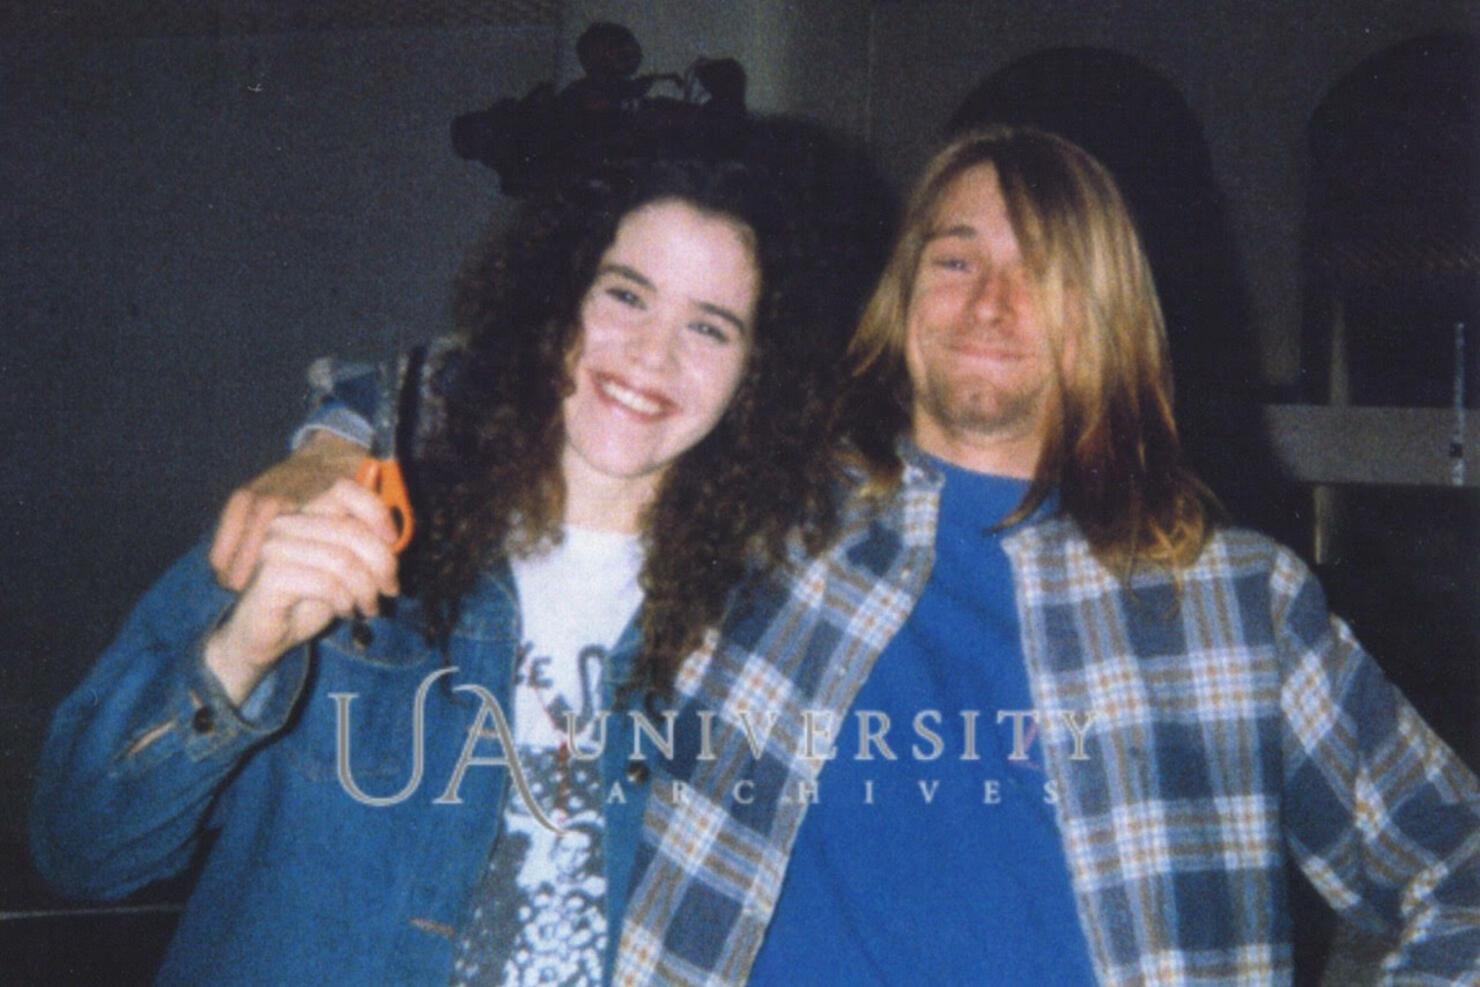 Tessa Osbourne and Kurt Cobain pose during a haircut in 1989